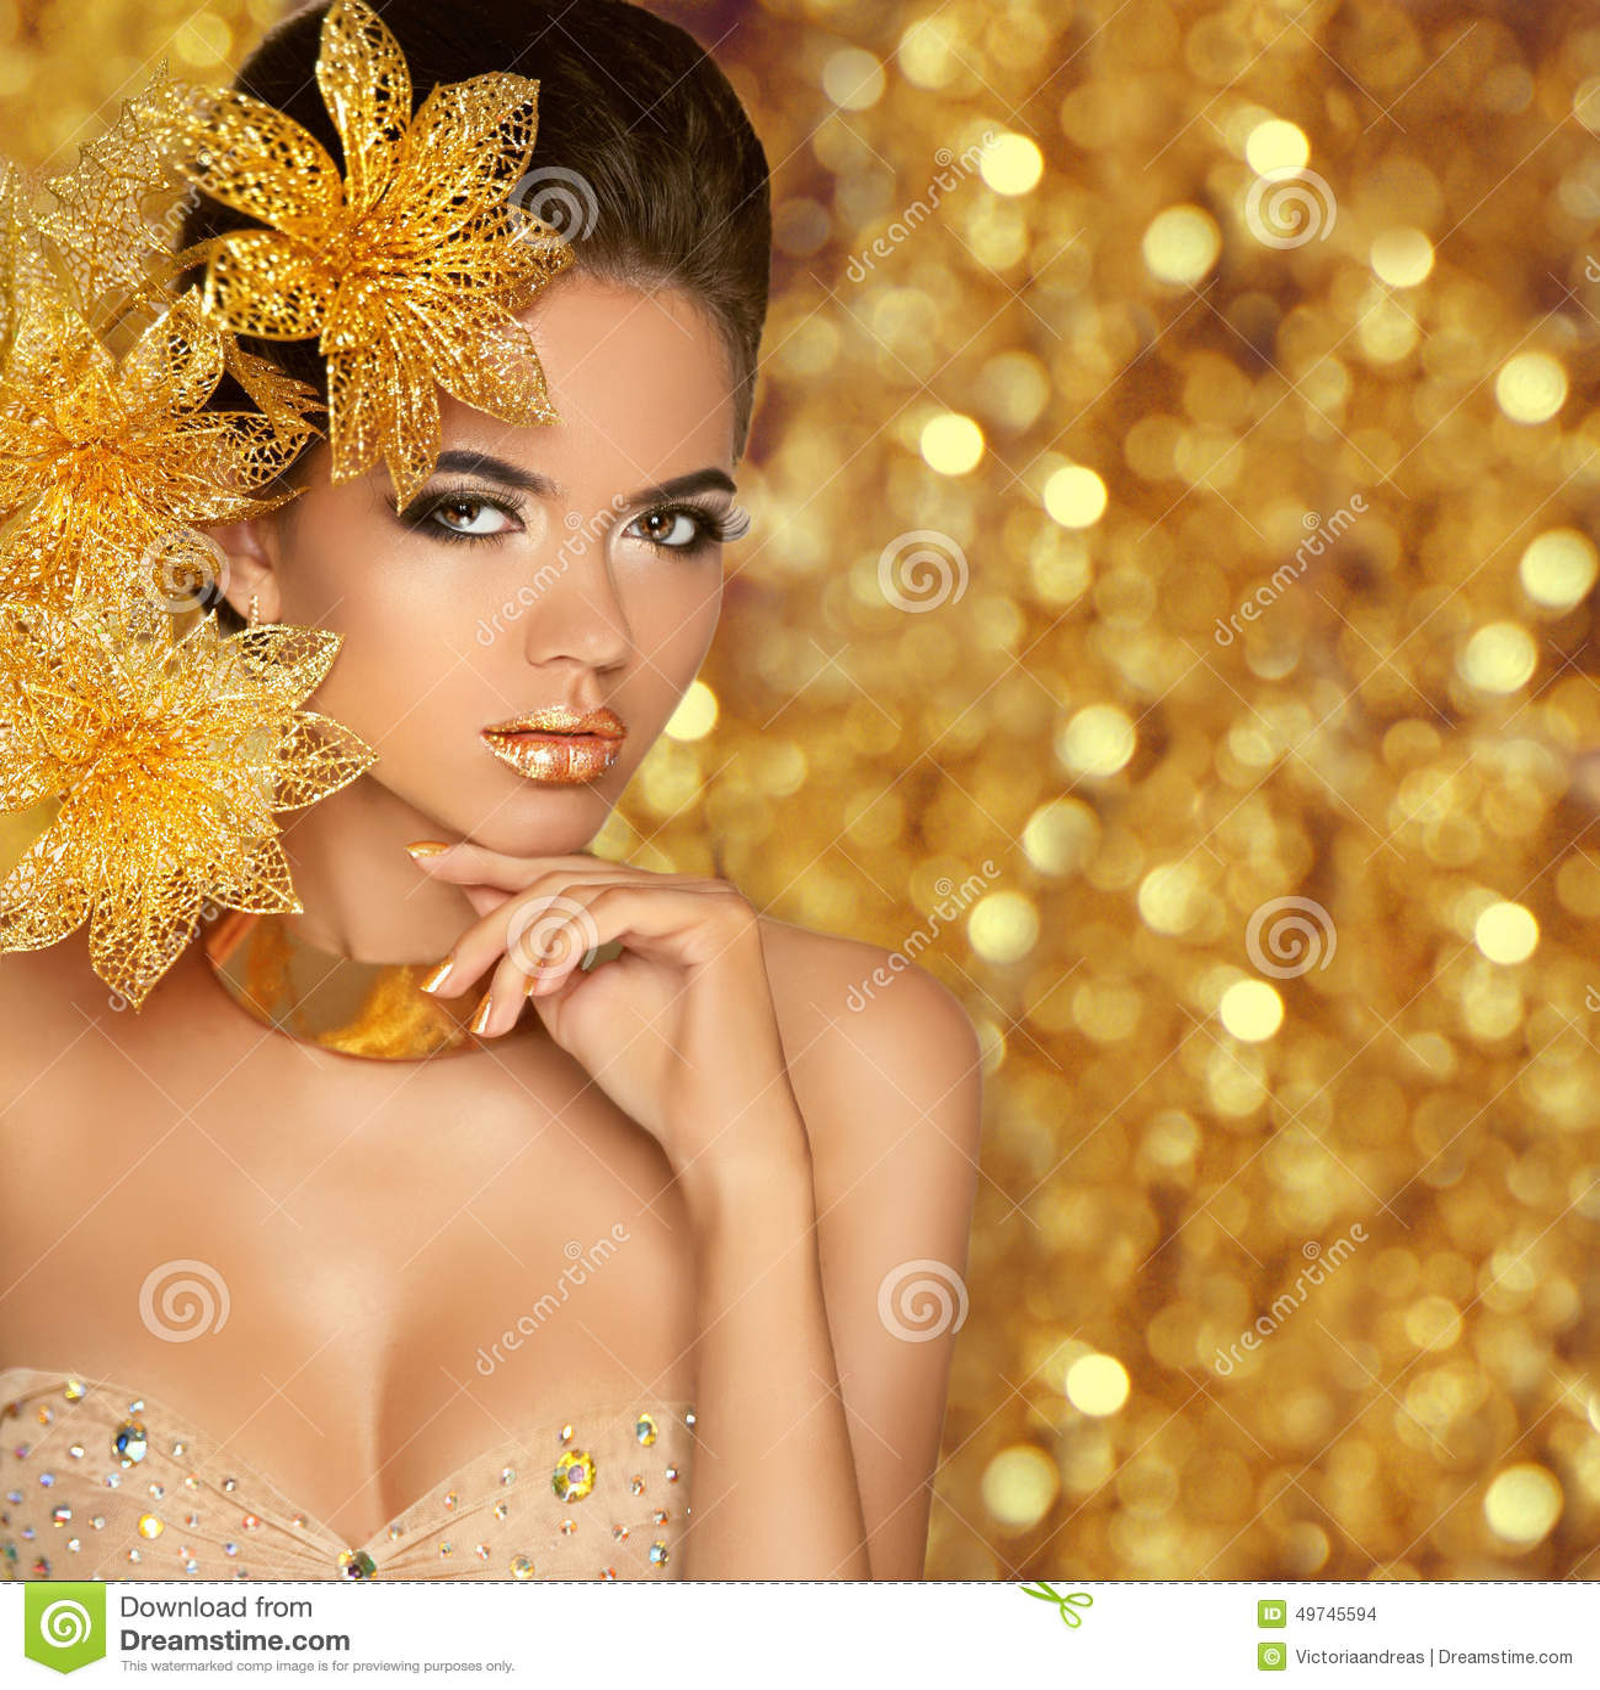 Beauty Girl Portrait Isolated on golden Christmas glittering lights ...